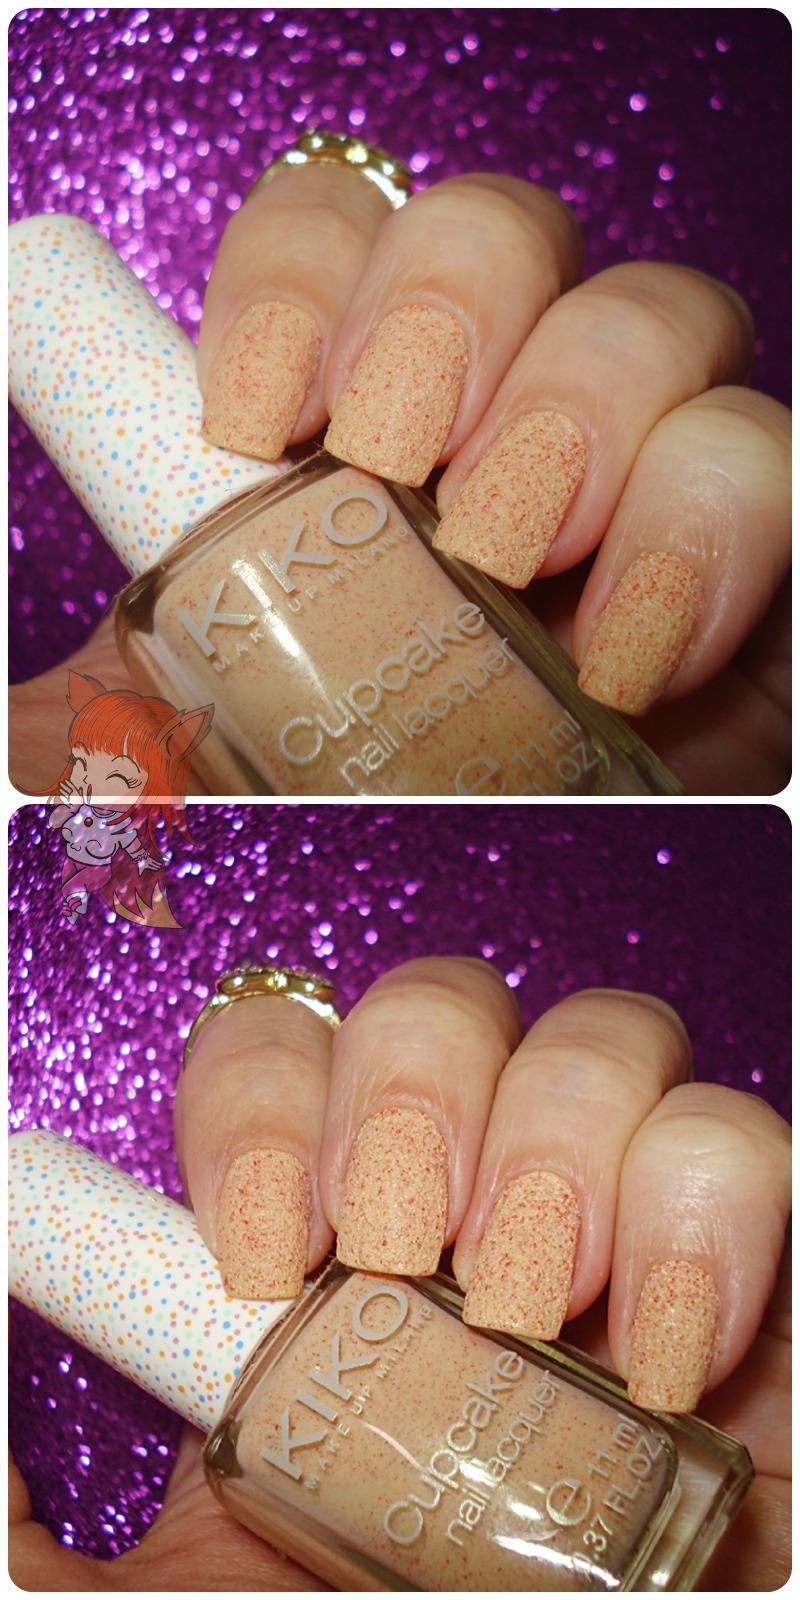 Esmalte Kiko Cupcake 649 Apricot - Resenha